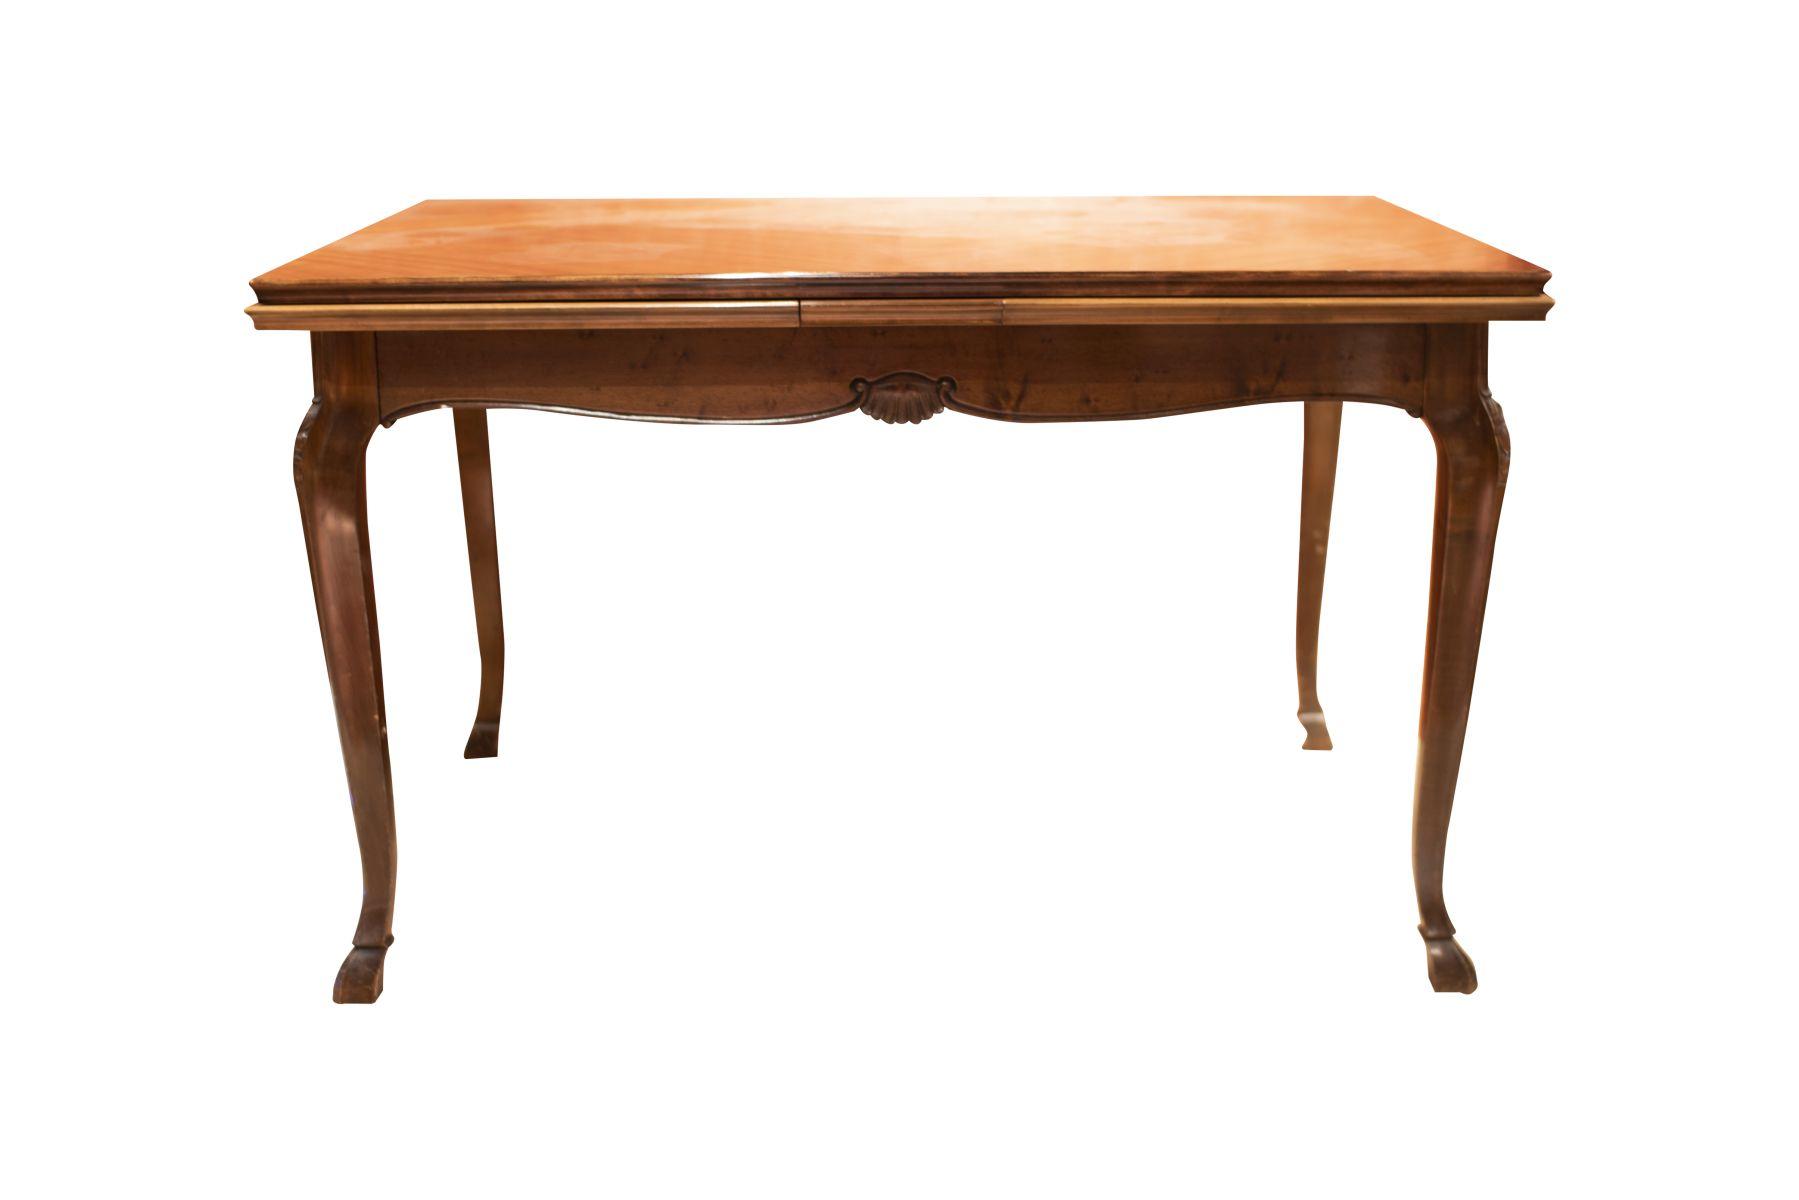 #12 Dining Table with Extendable Top | Esstisch mit ausziehbarer Platte Image